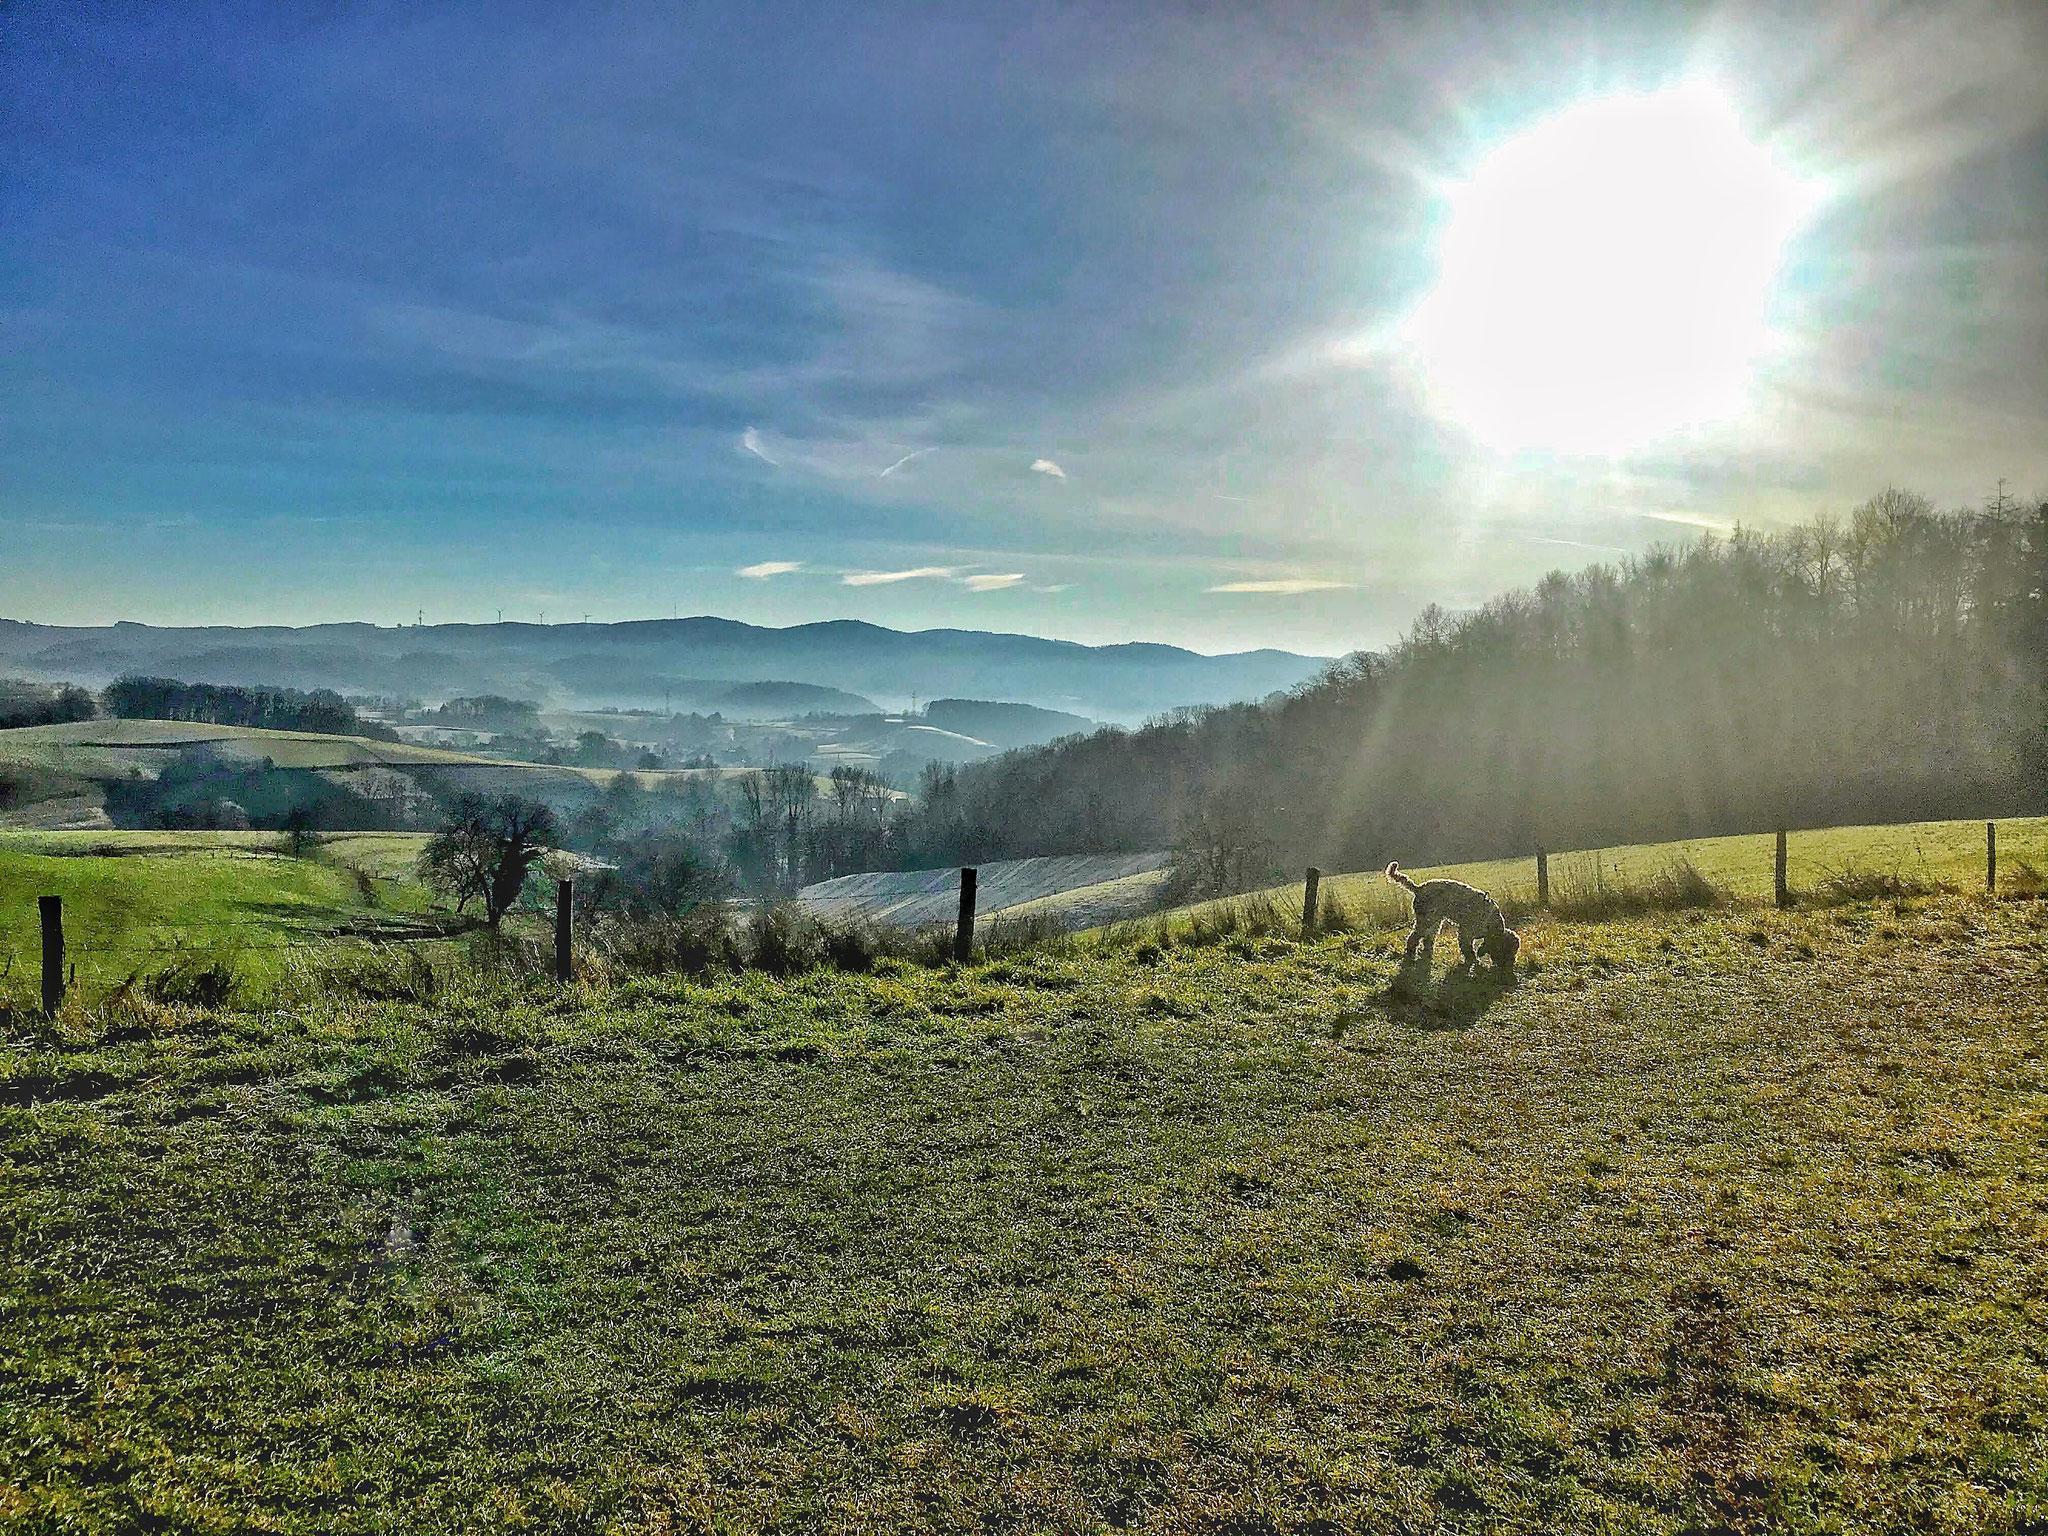 Hemsbach auf dem Berg